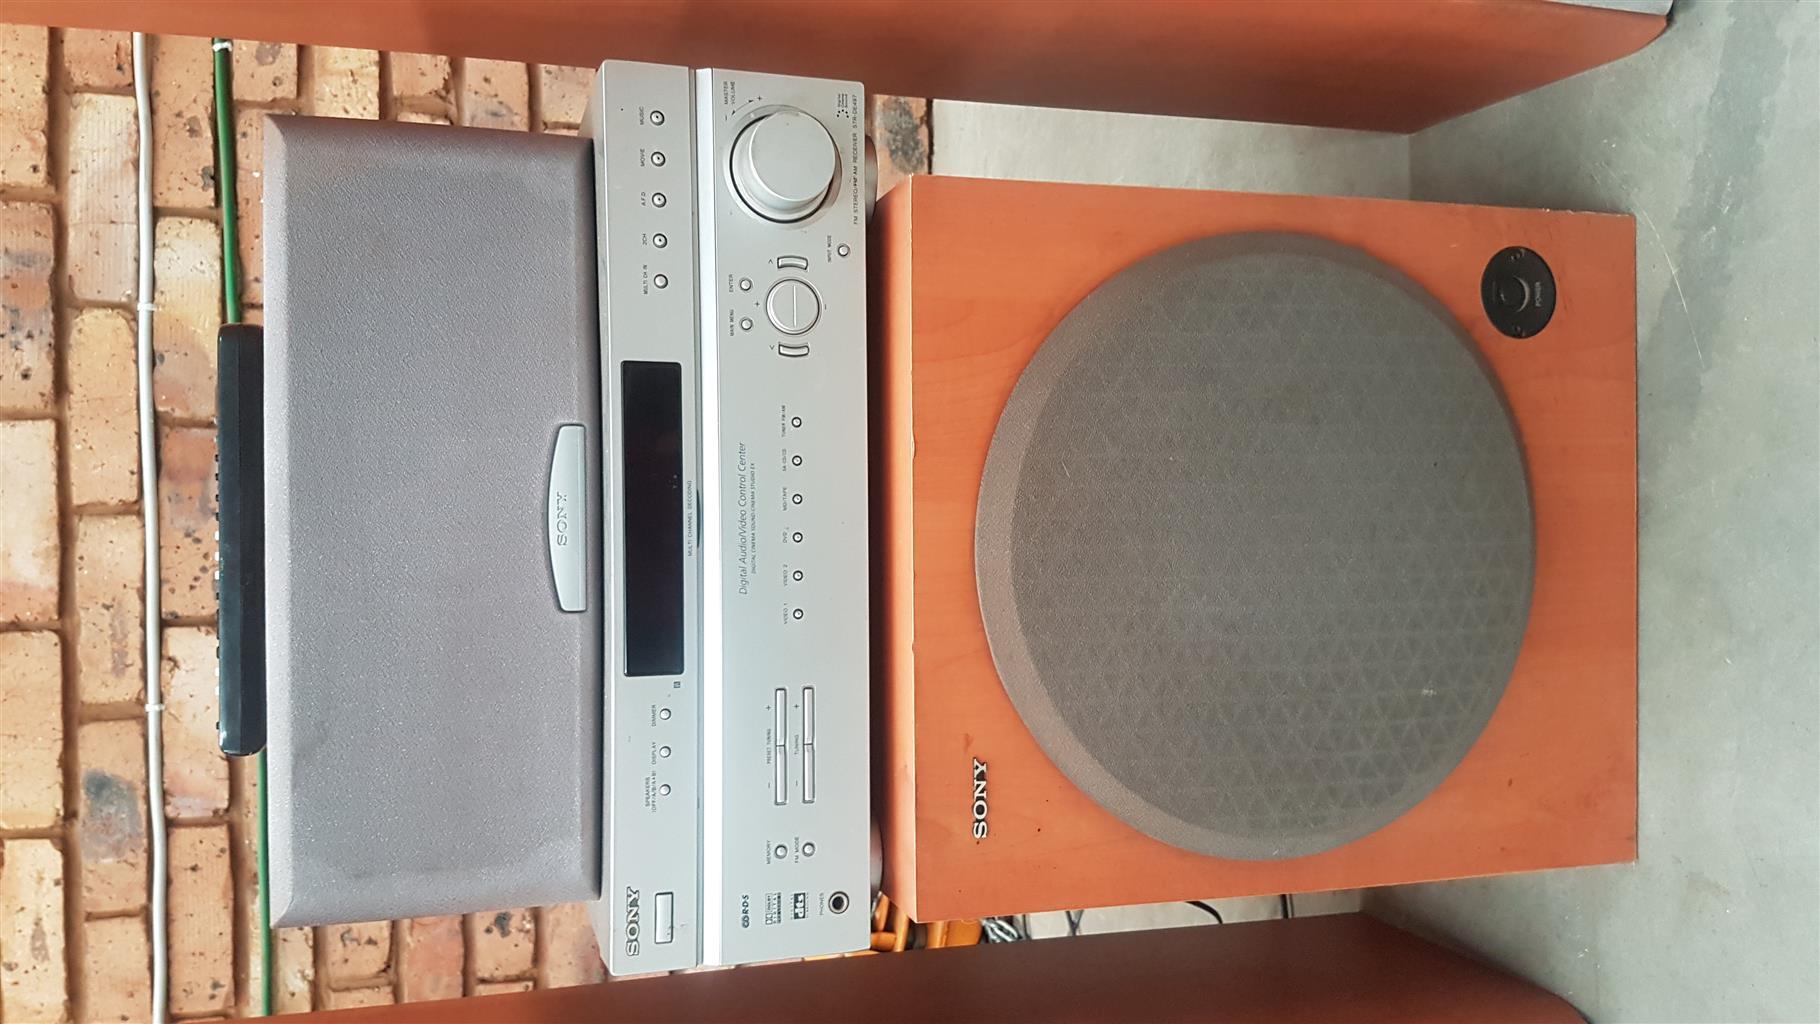 Sony 5.1 sound system